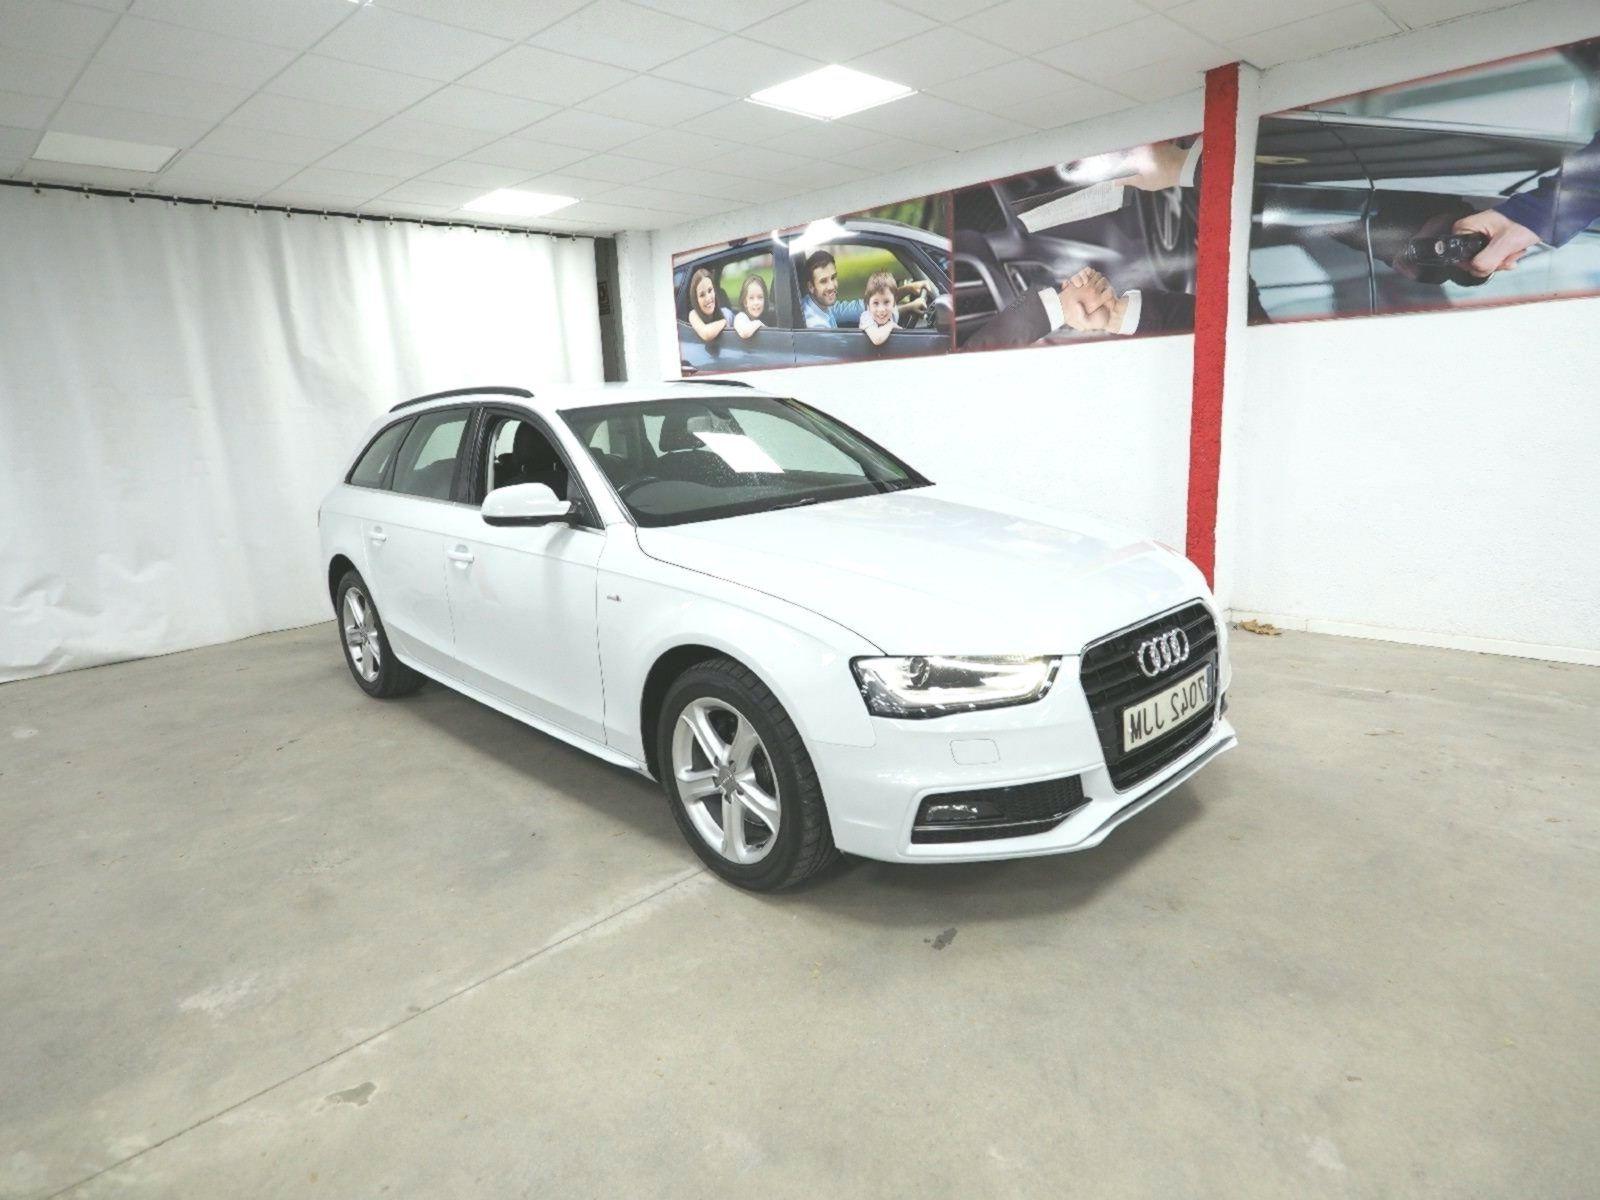 Audi A4 Avant 20 Tdi Sline Since 2020 Price 16990 Finance It From In 2020 Audi A4 Audi A4 Avant A4 Avant